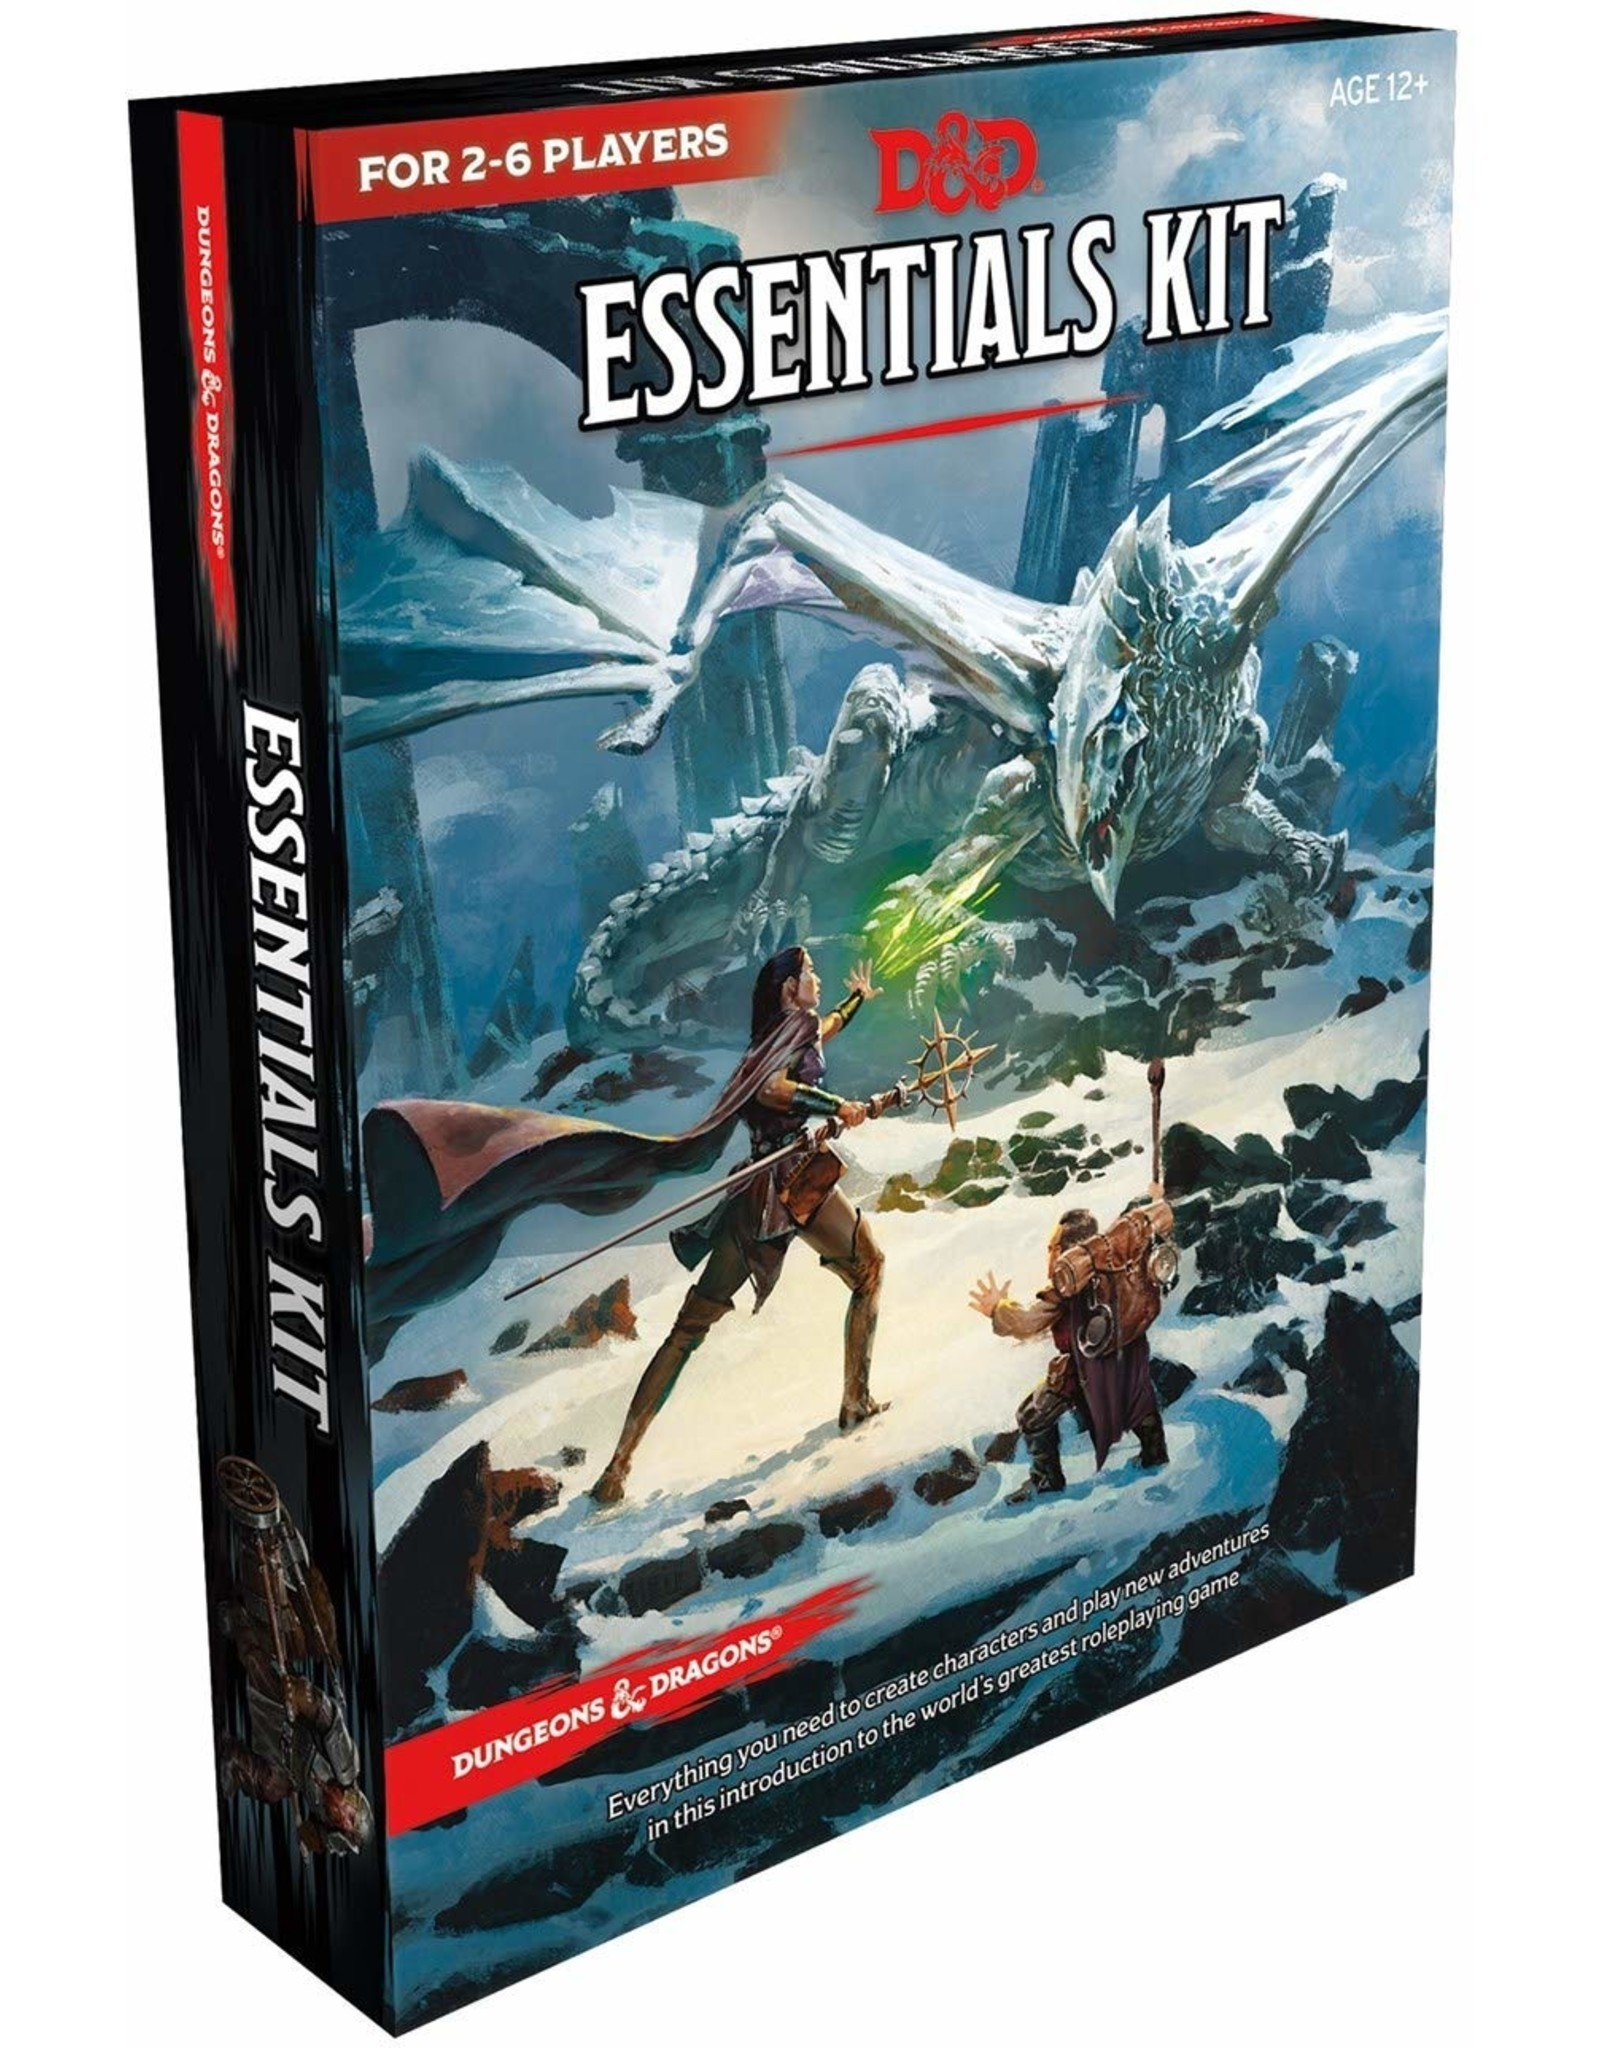 Dungeons & Dragons D&D Essentials Kit